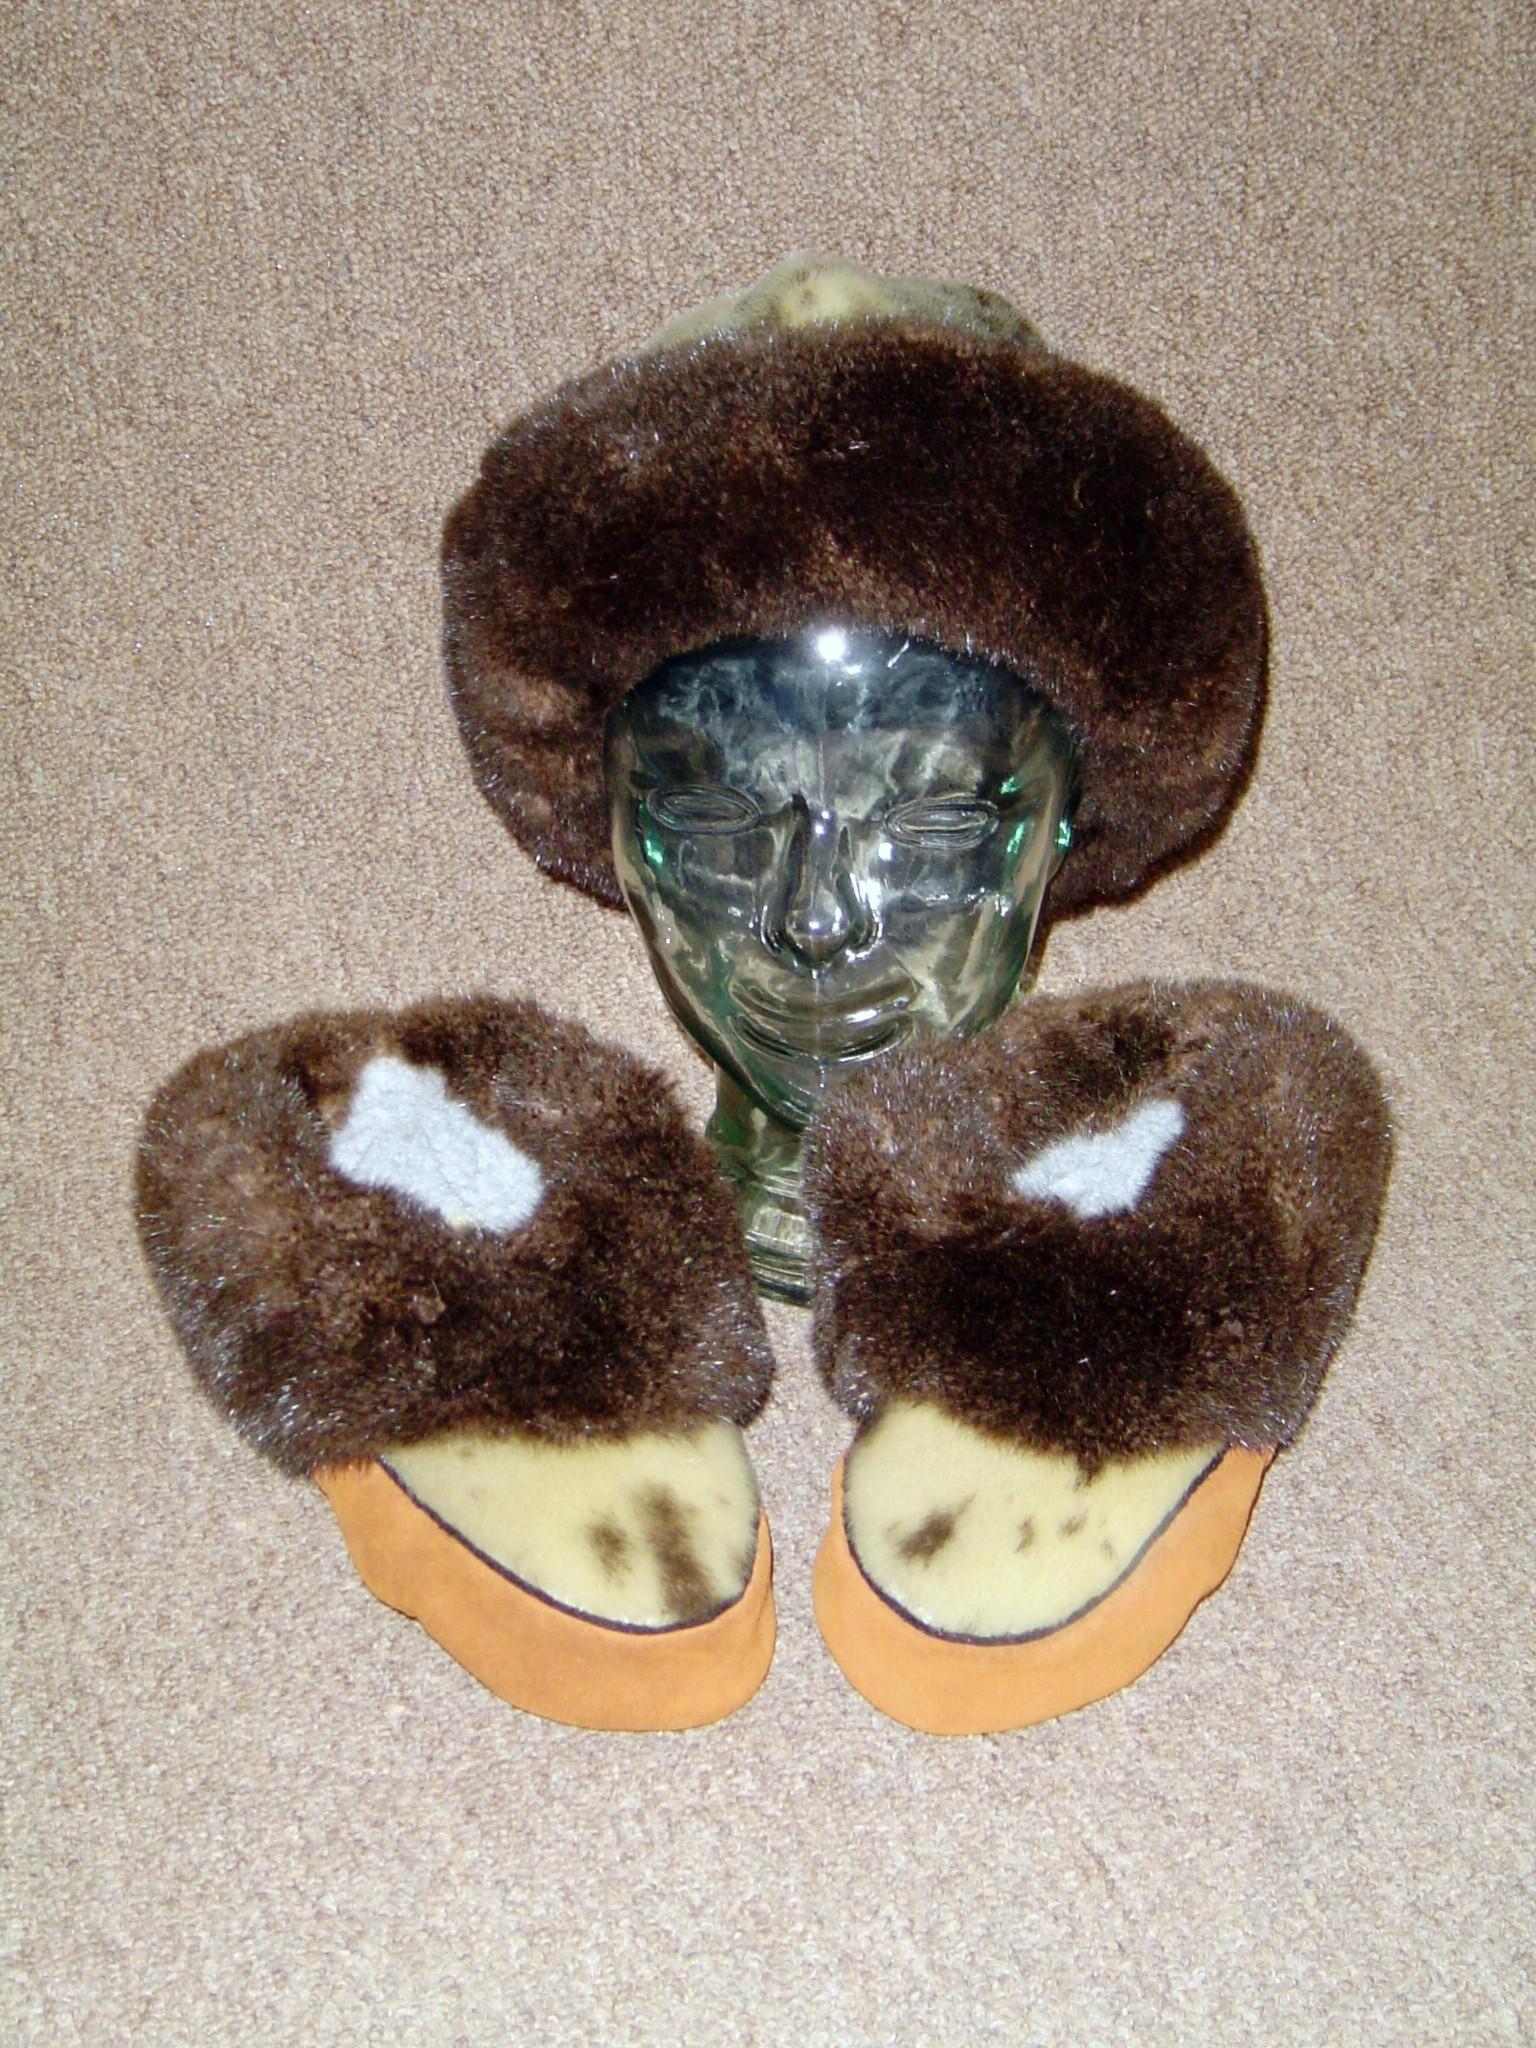 Fur hat & slippers